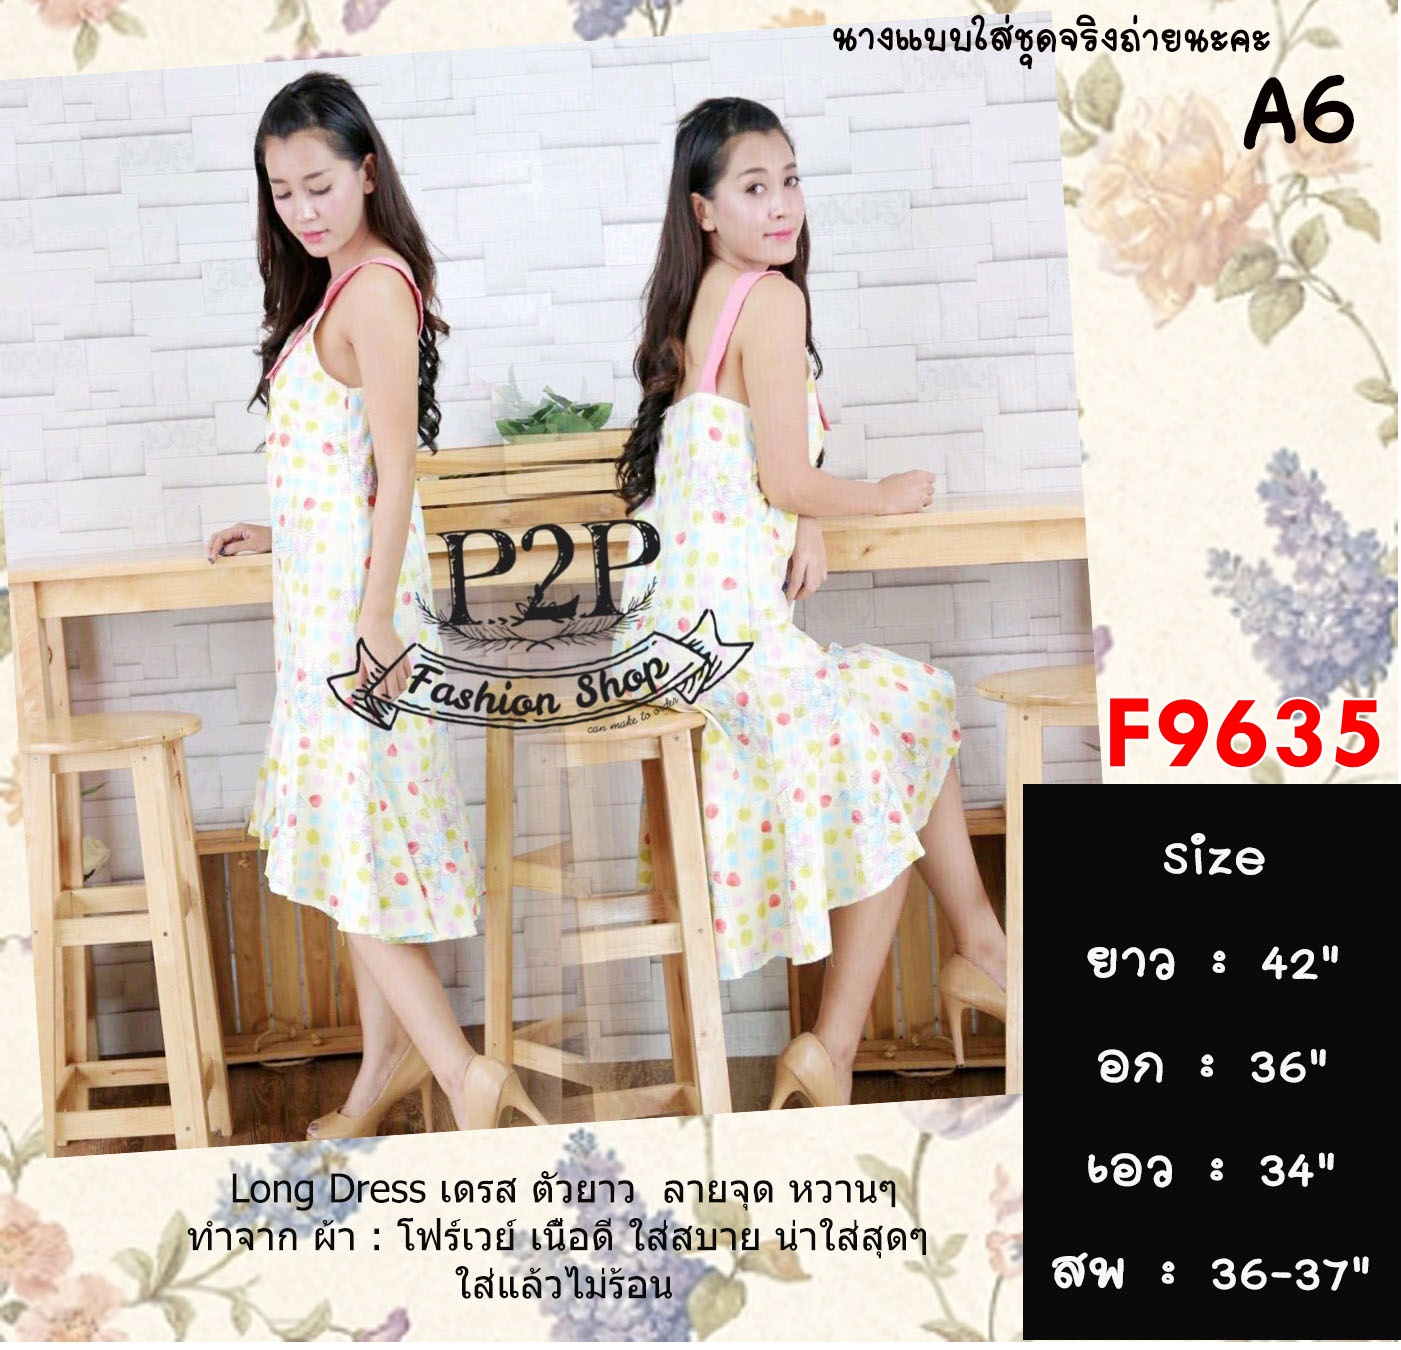 F9635 Long dress เดรสตัวยาว ลายจุด สีชมพู